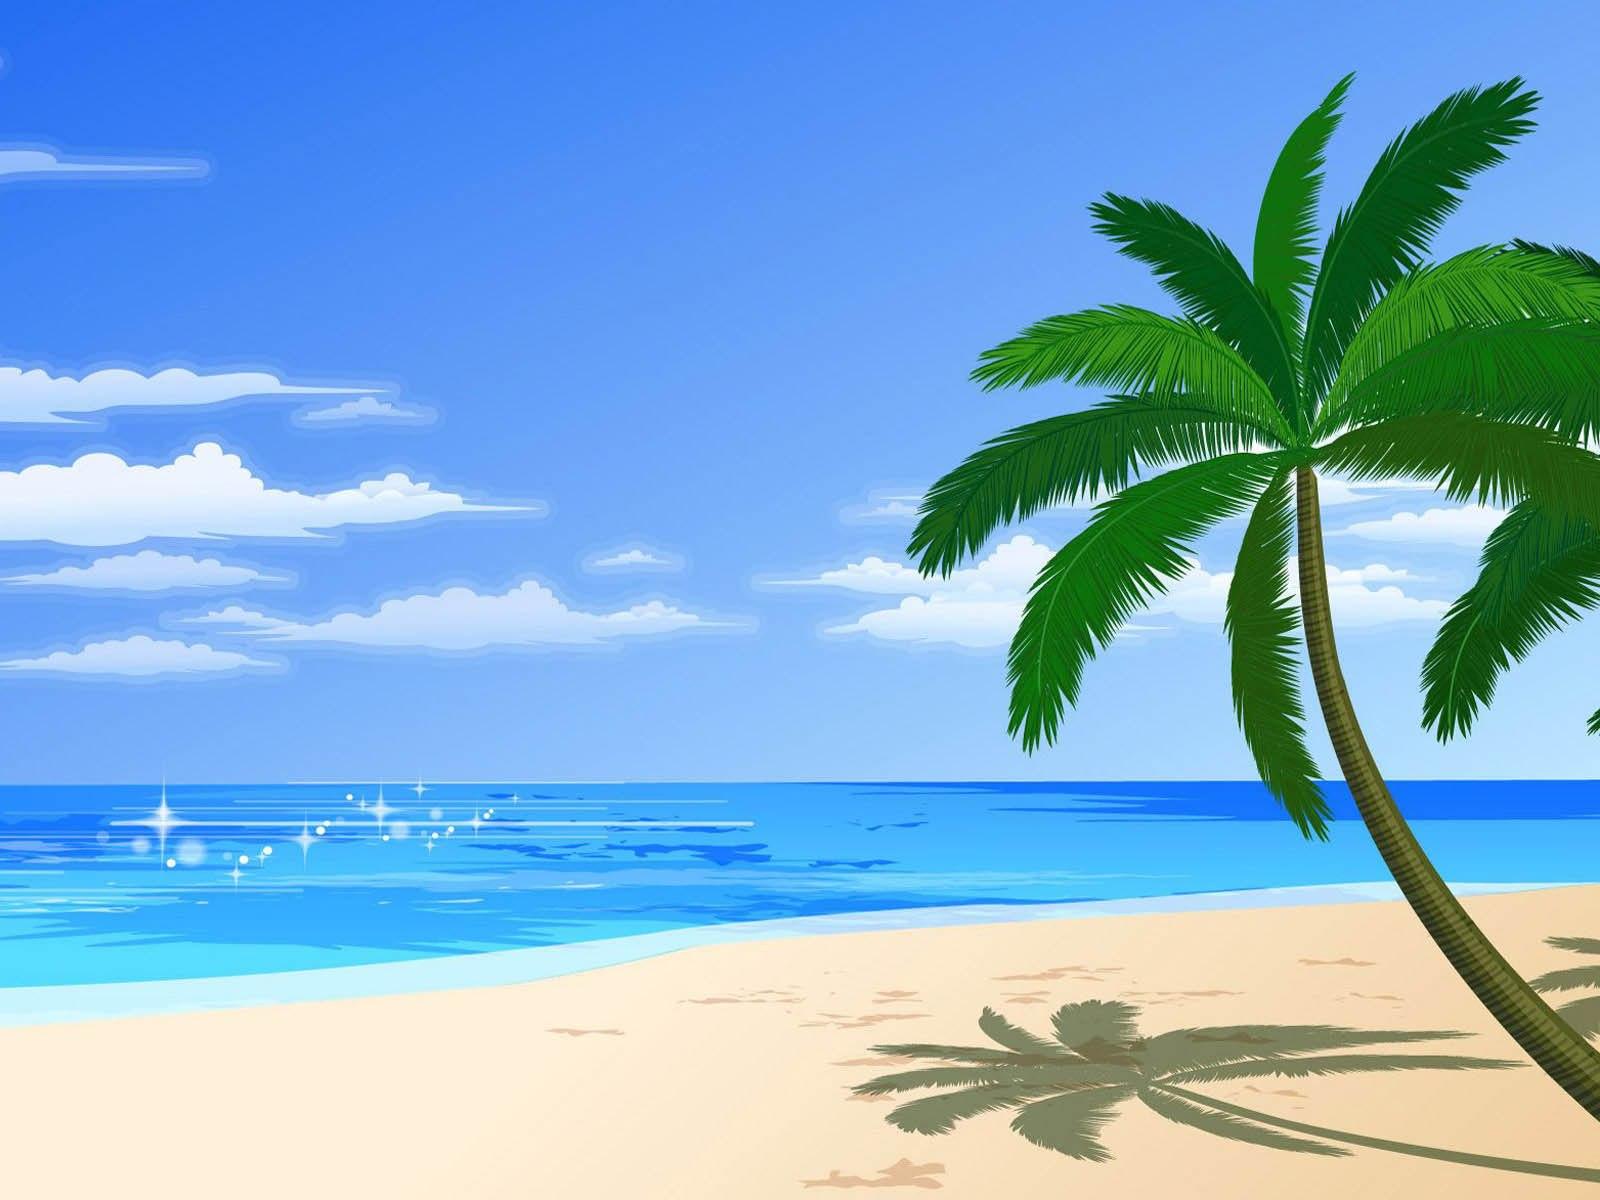 Beach clipart background 5 » Clipart Portal.